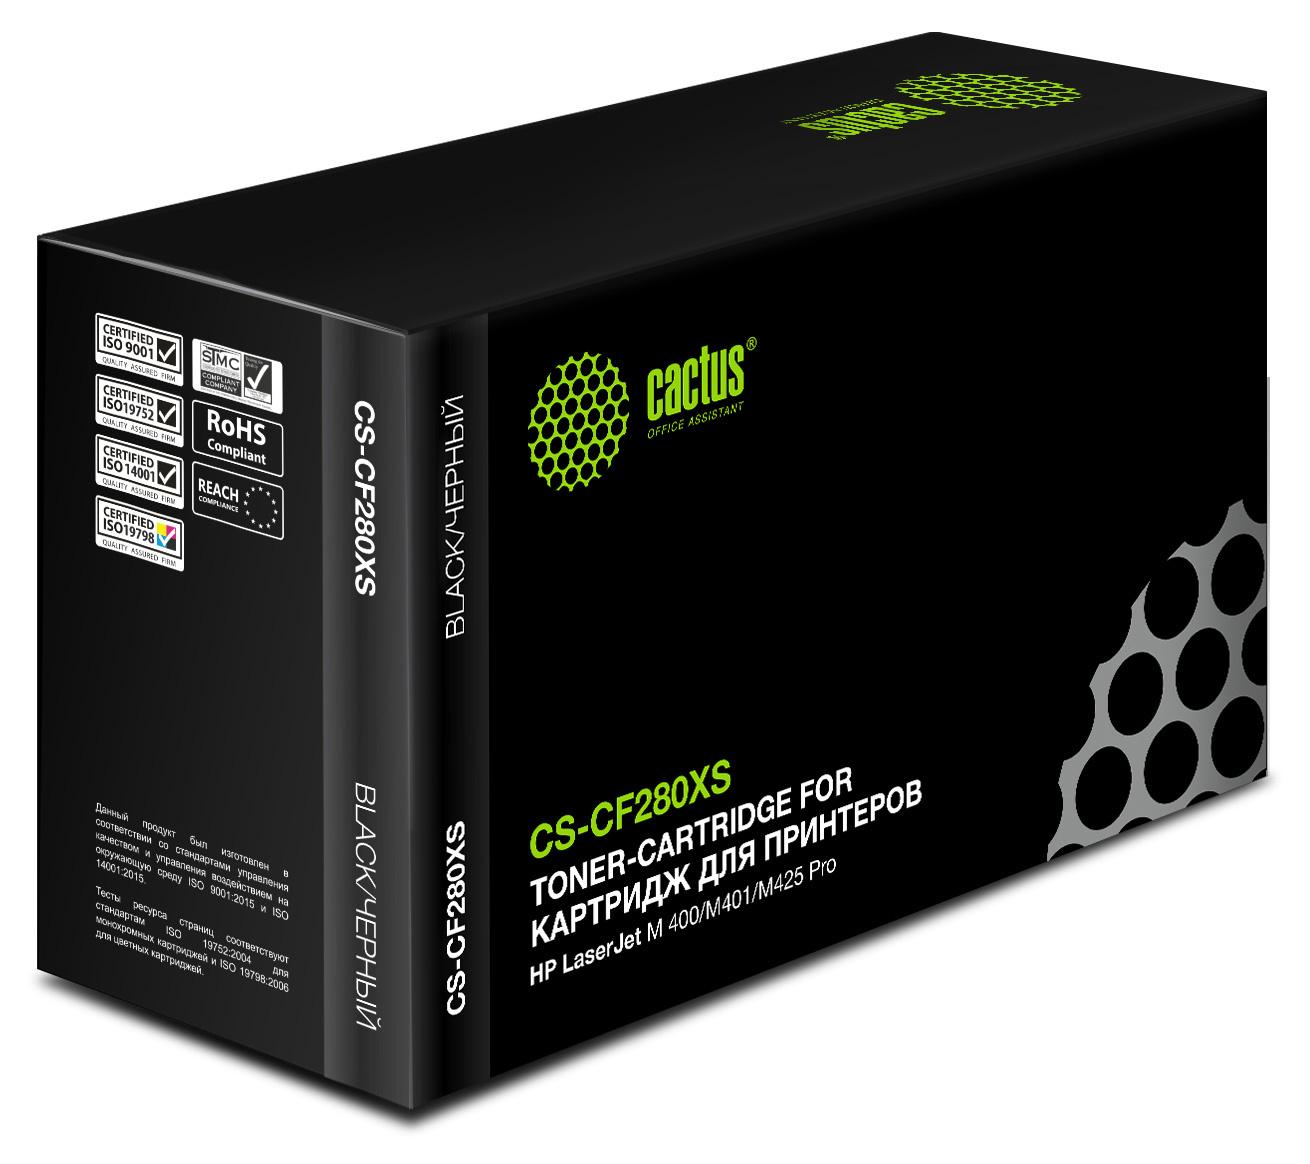 toner-hp-laserjet-pro-400-mfp-m425dn-v-moskve